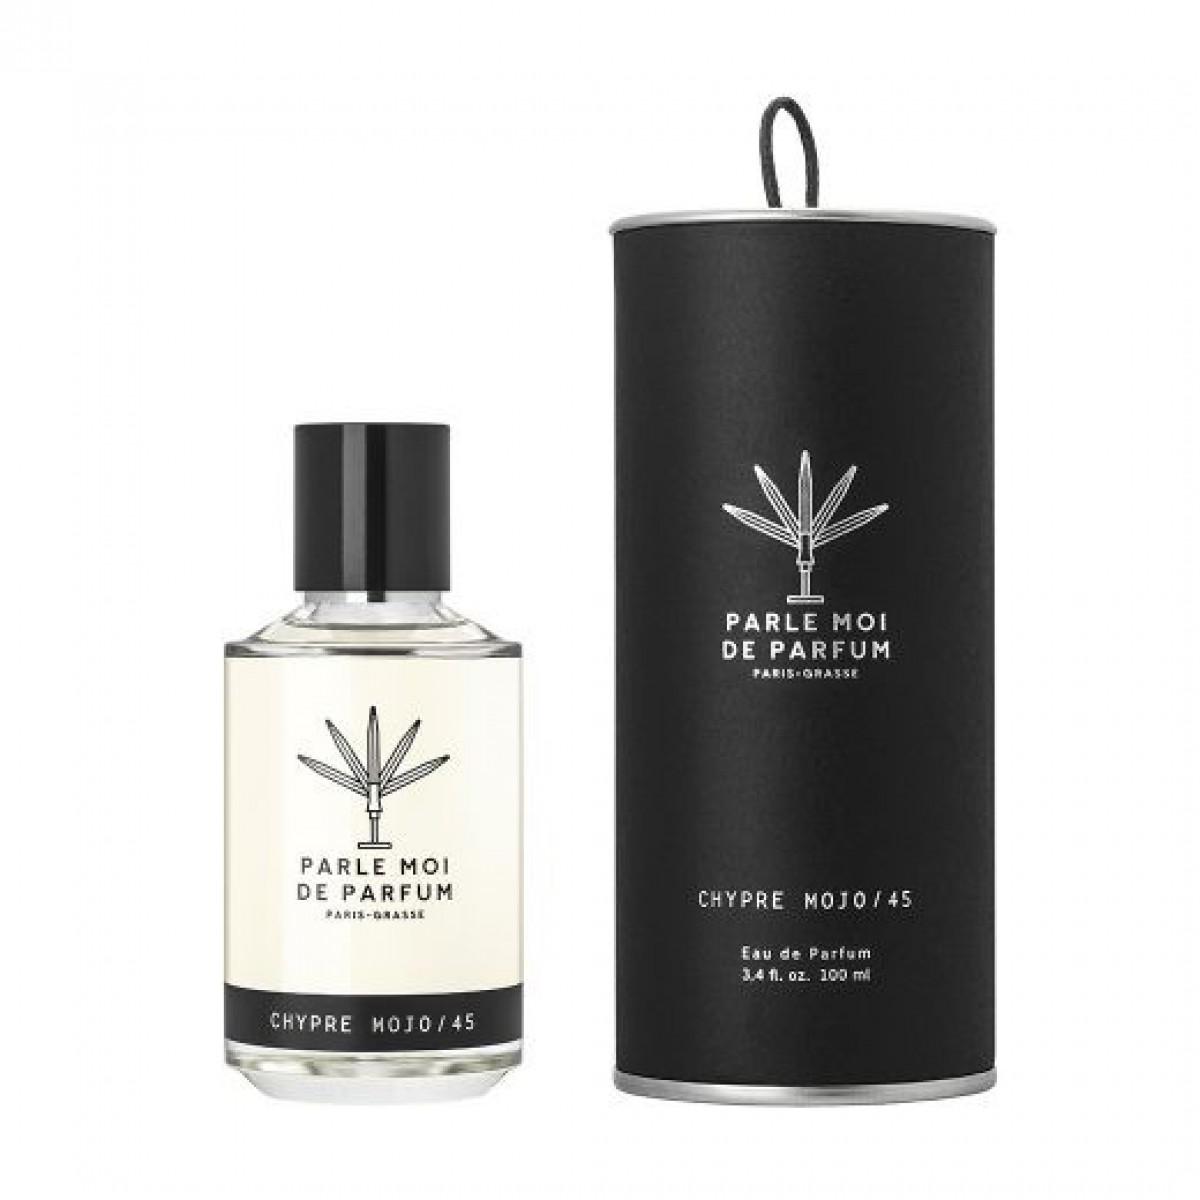 Сhypre Mojo/45 Eau de Parfum